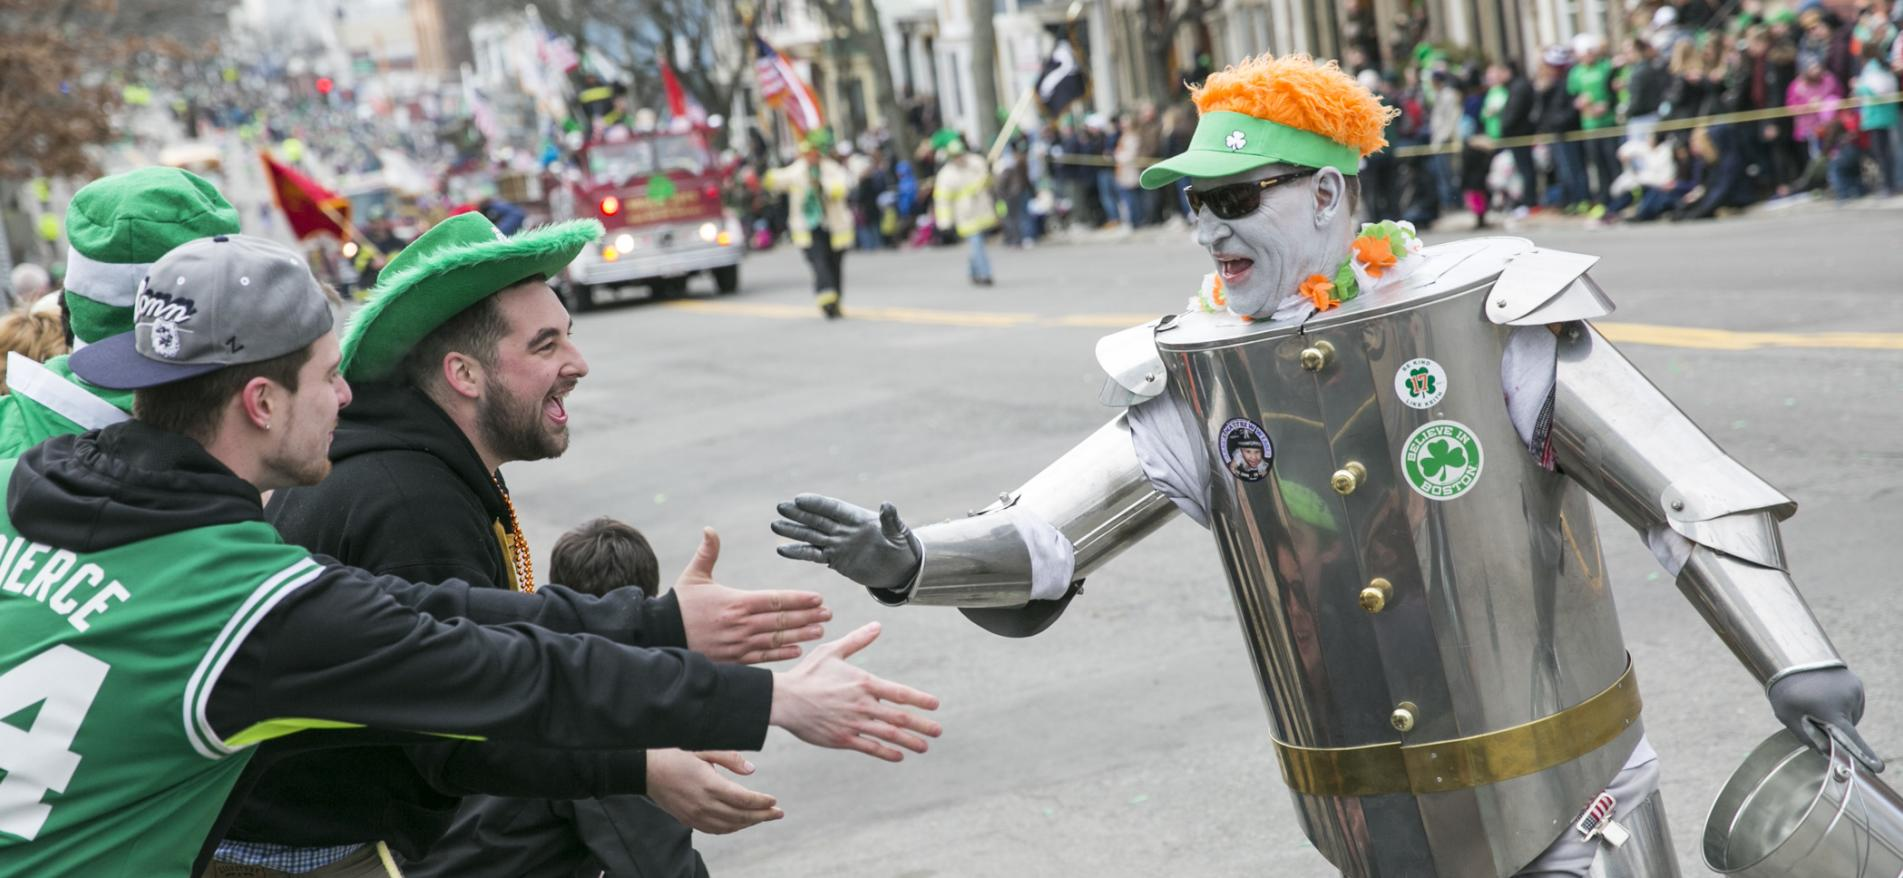 St Patrick S Day 2019 In Boston Events The Dropkick Murphys